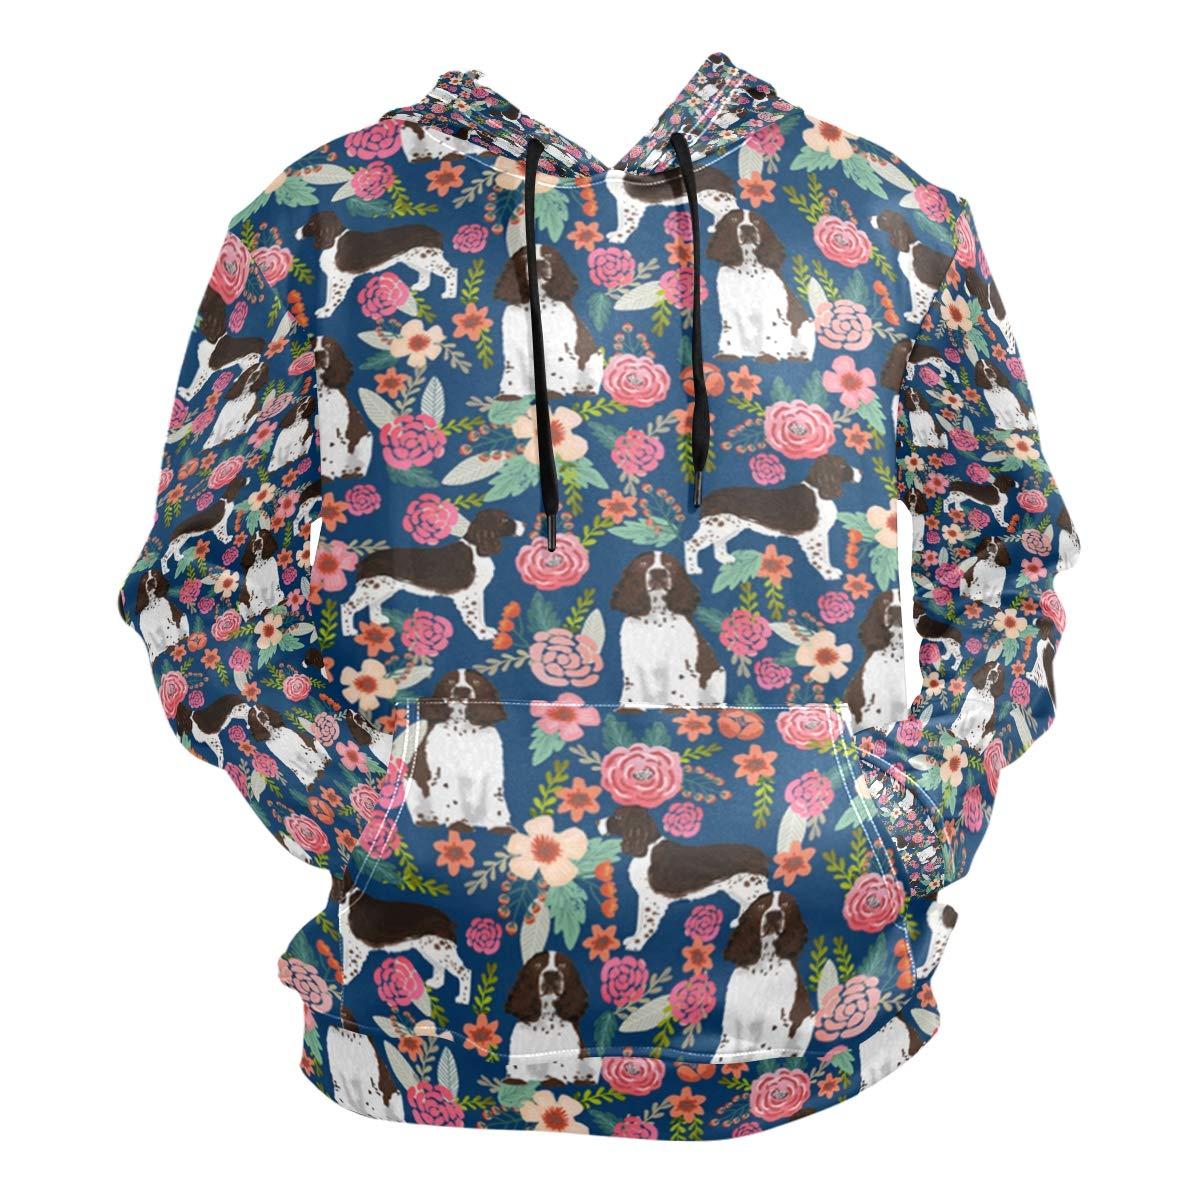 Medium Charlley Lee Men's Hooded Sweatshirt English Springer Spaniel and Retro Floral Fashion Hoodie